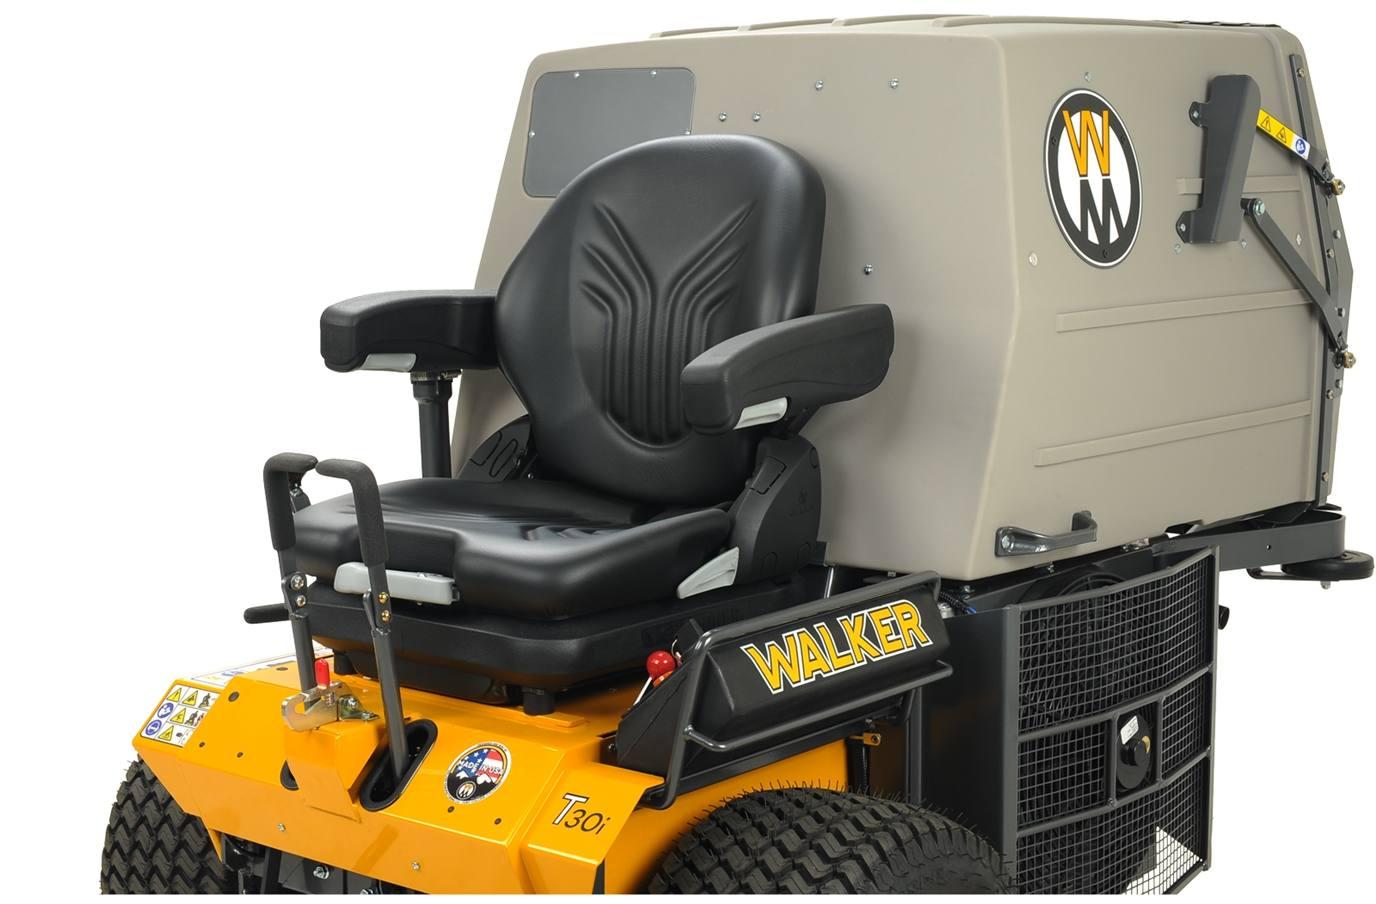 2019 Walker Mowers Suspension Seat for sale in Austin, TX